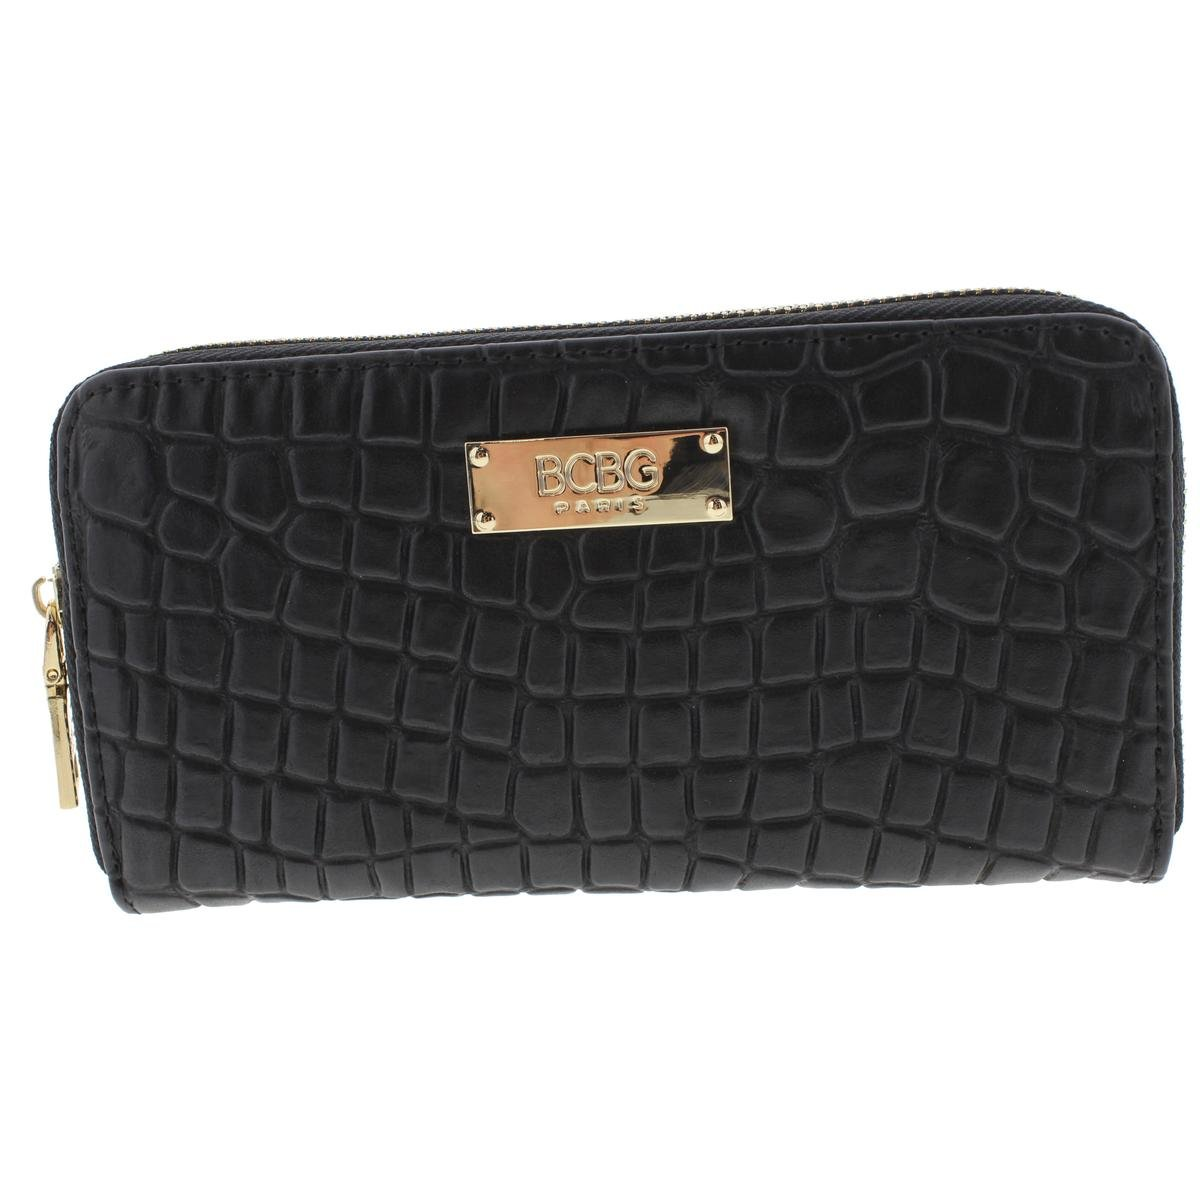 BCBG Womens Malibu Faux Leather Embossed Zip Around Wallet Black O/S